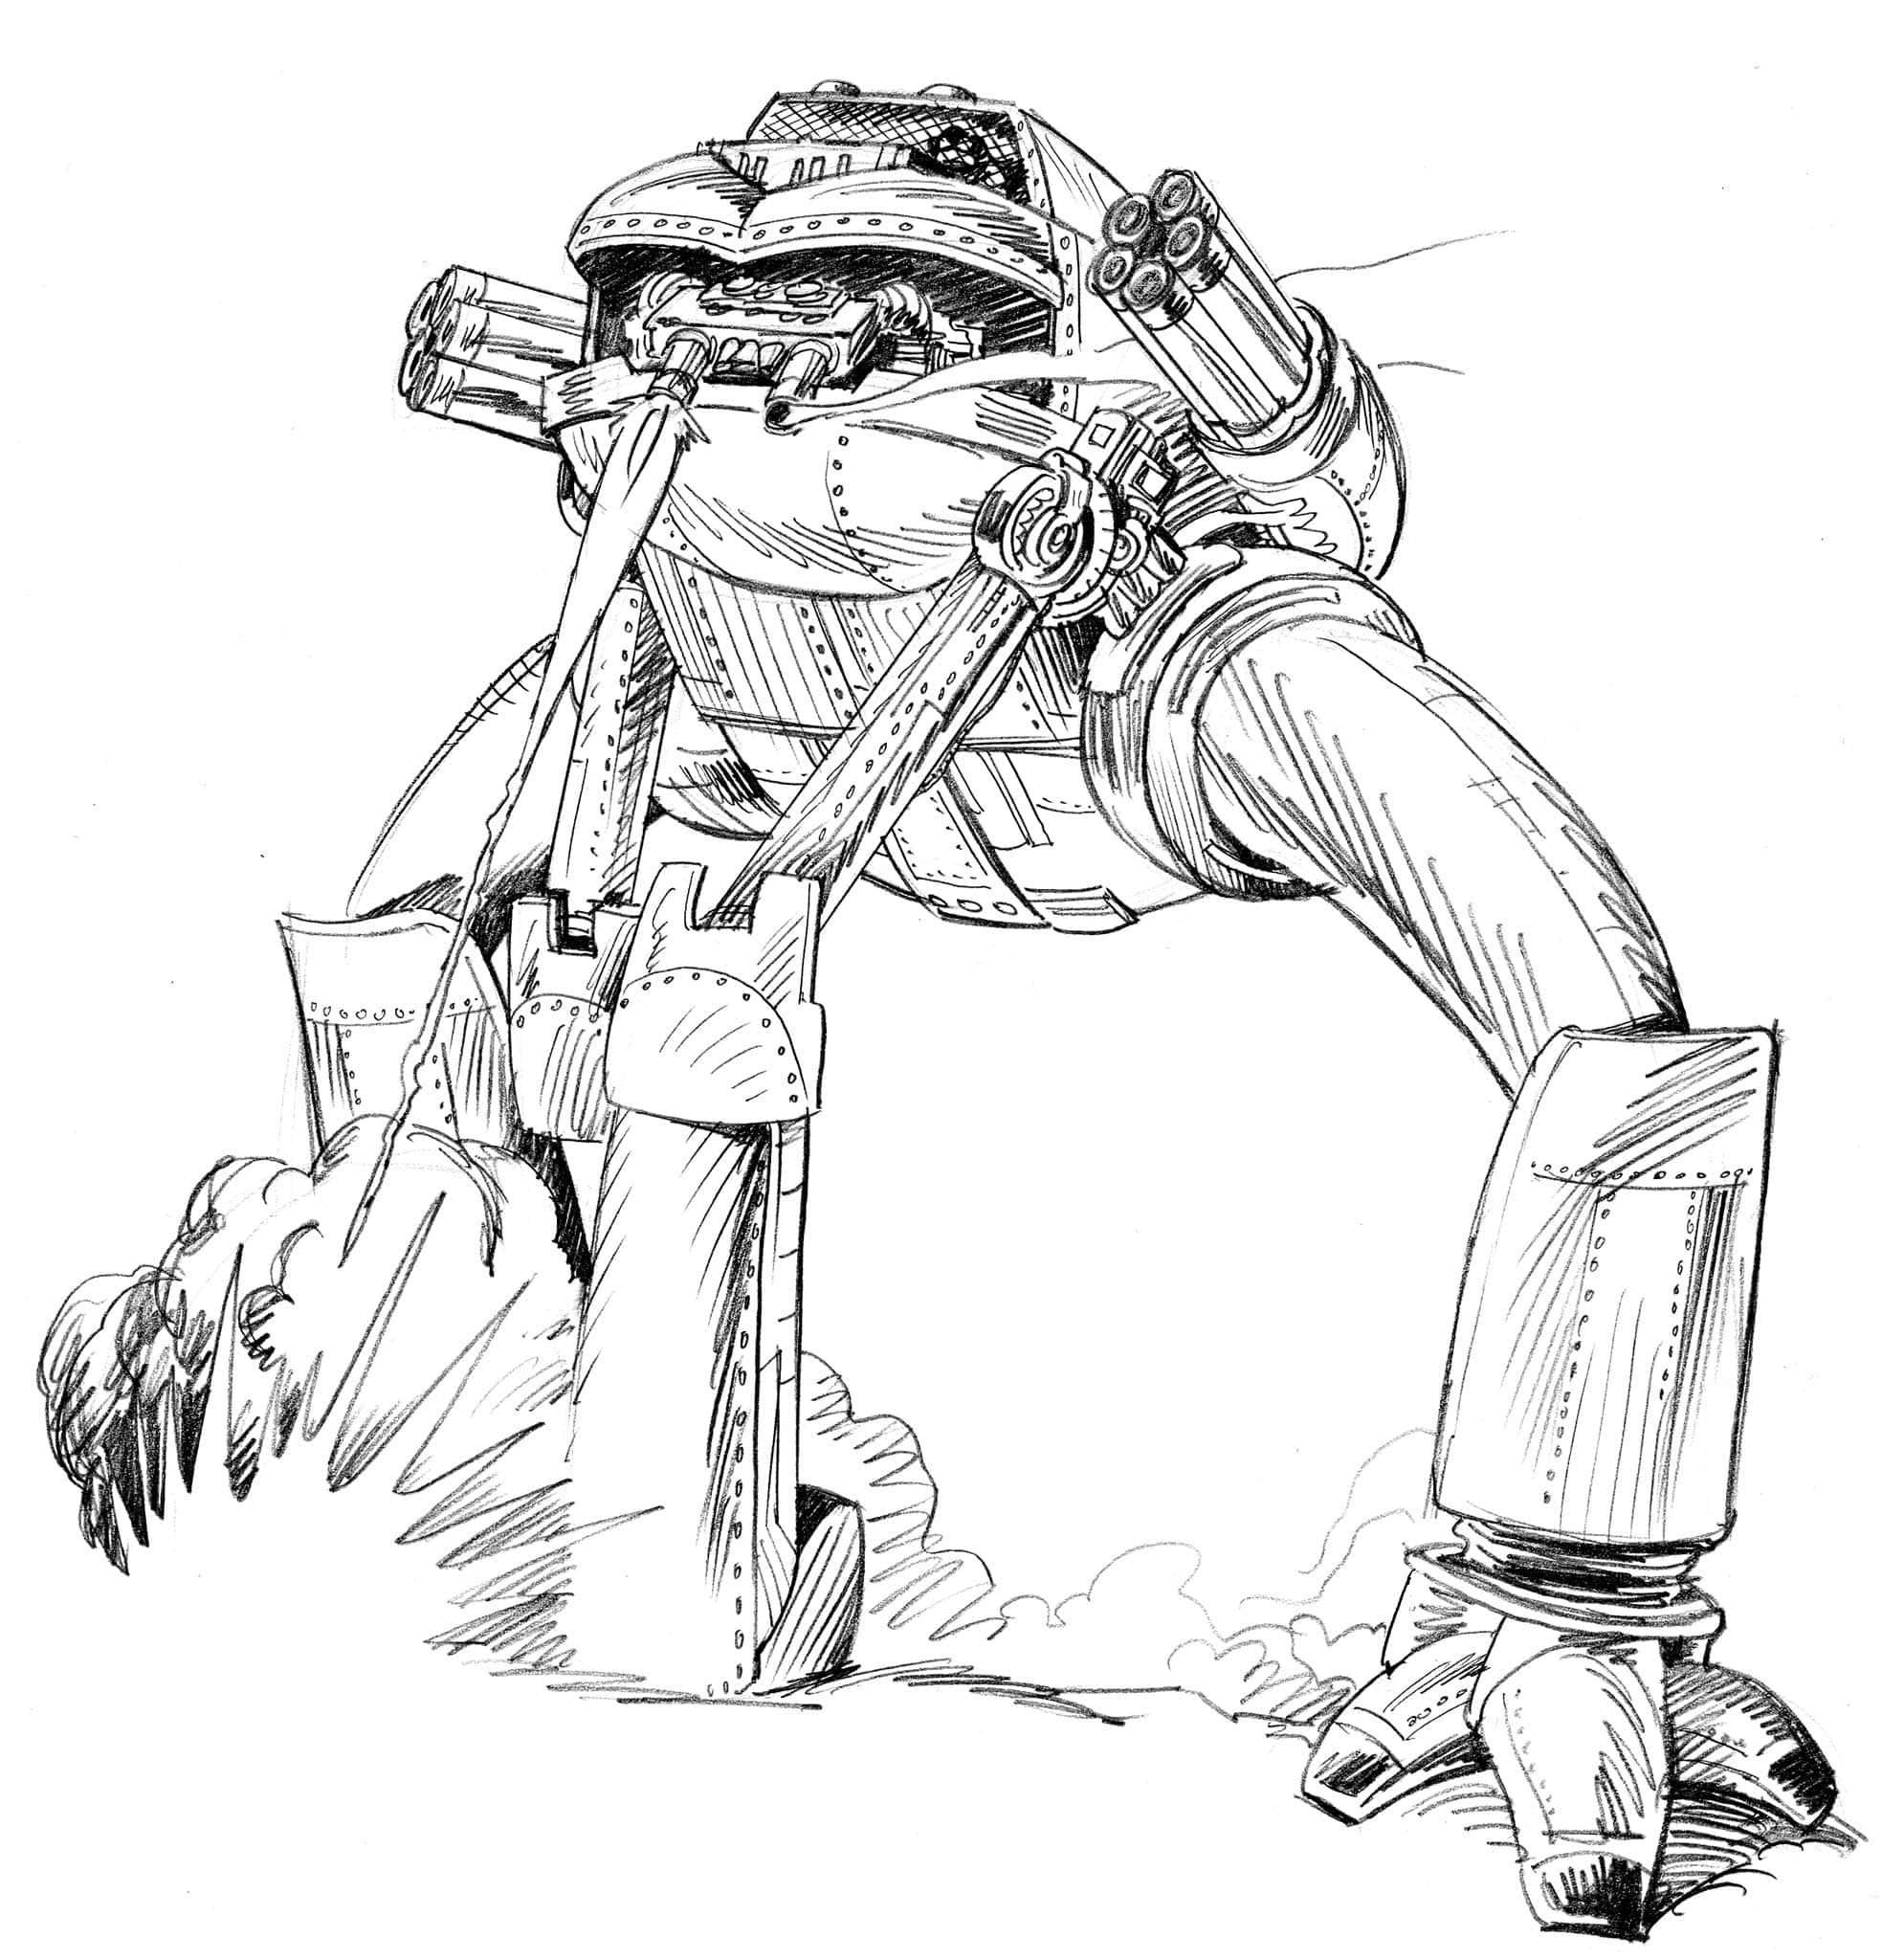 KH2900G-battle-monkeys-walker